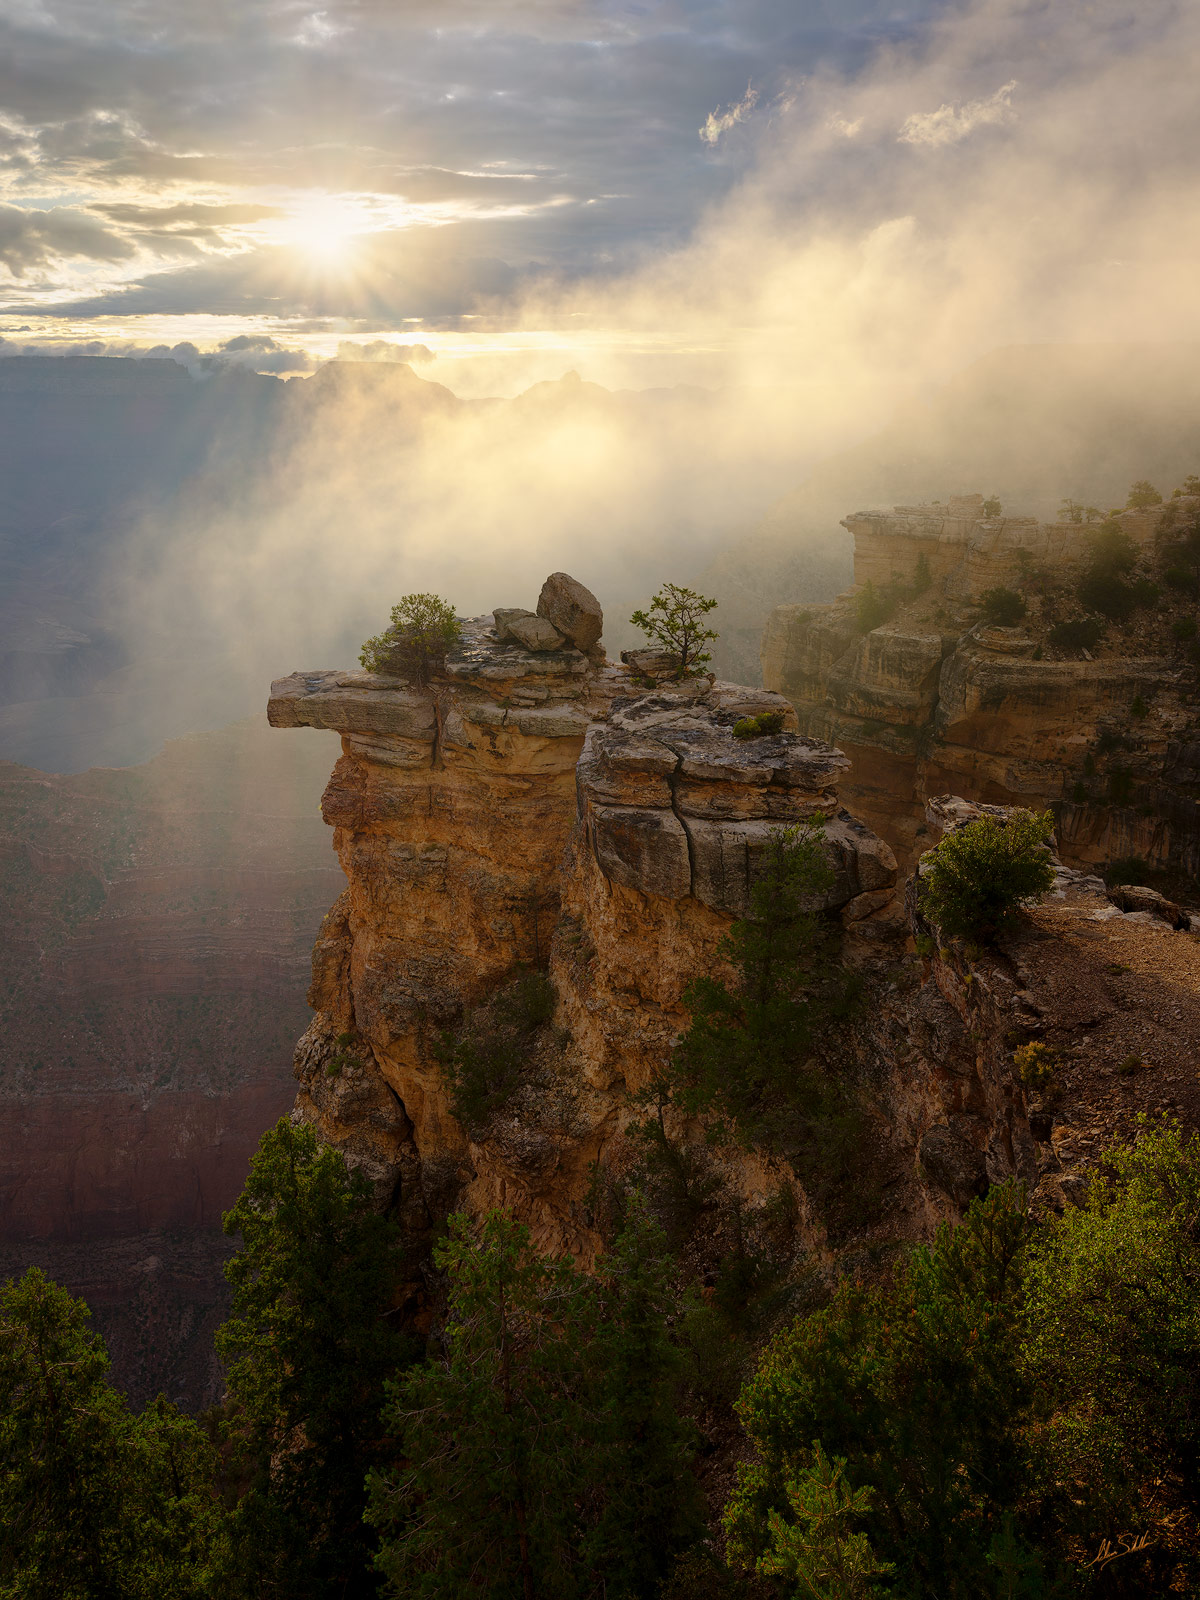 AZ, Arizona, Grand Canyon, Mather Point, National Park, South Rim, photo